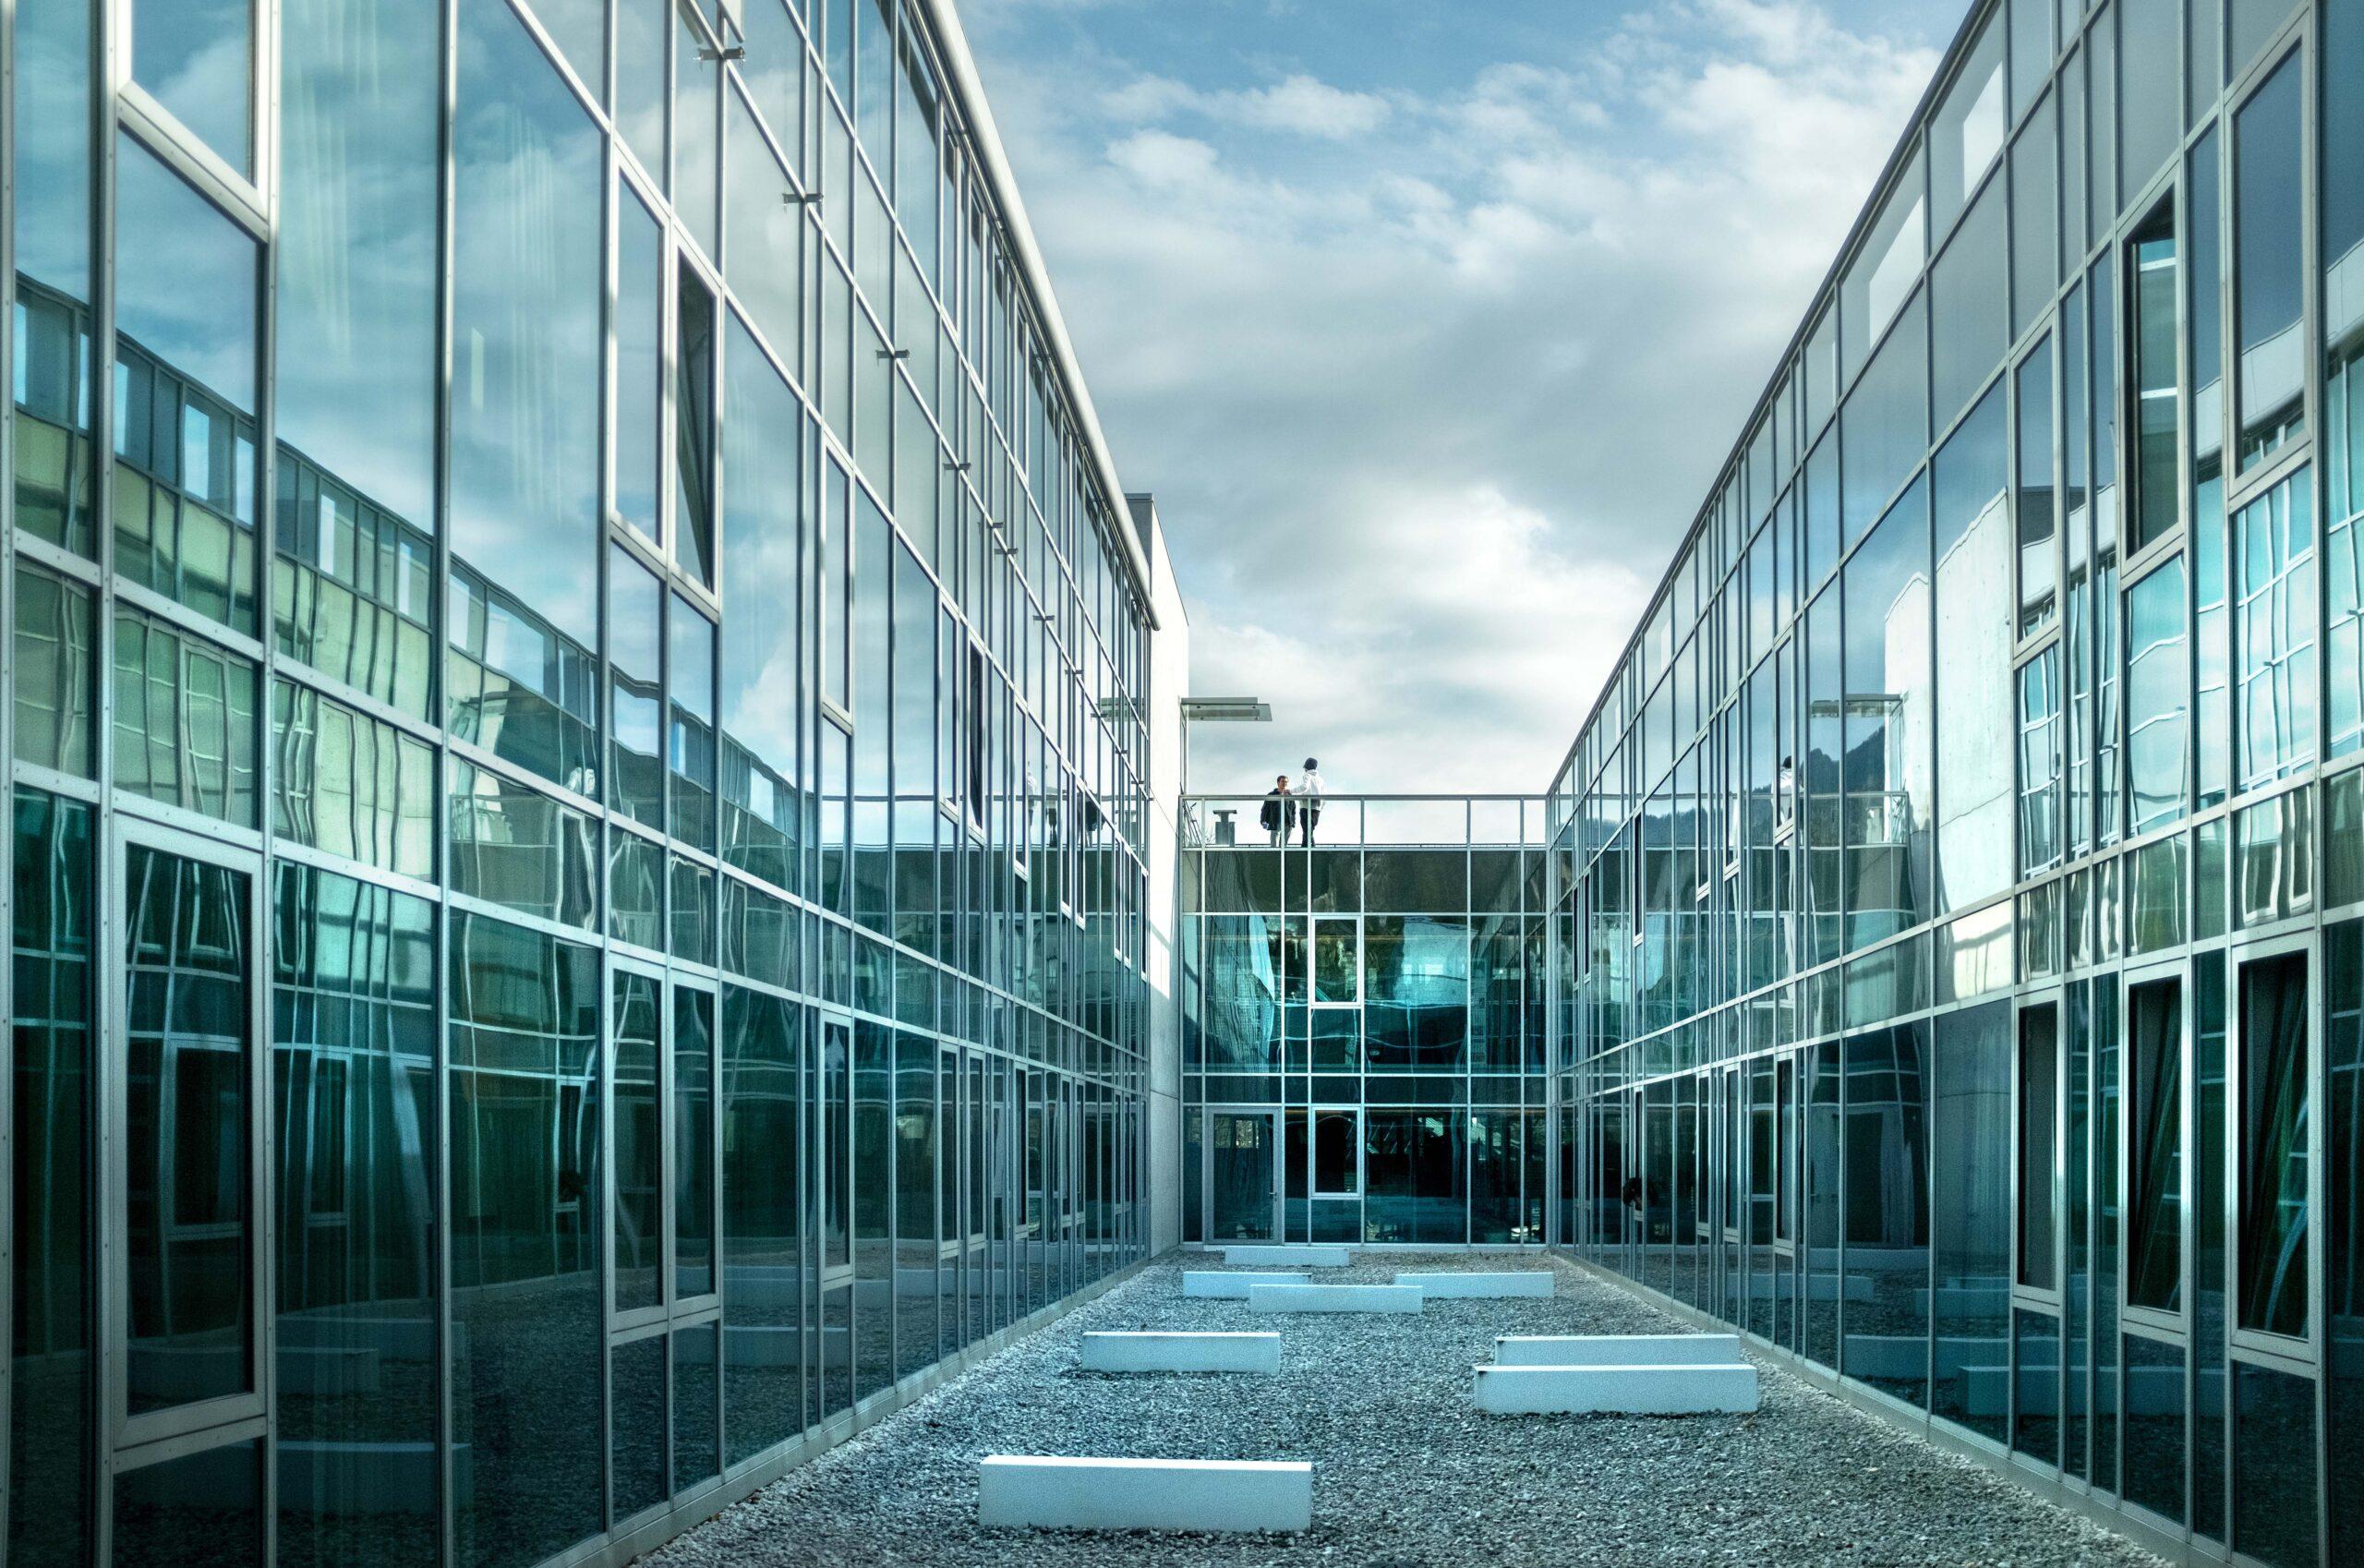 Unipark glass facade from inner courtyard